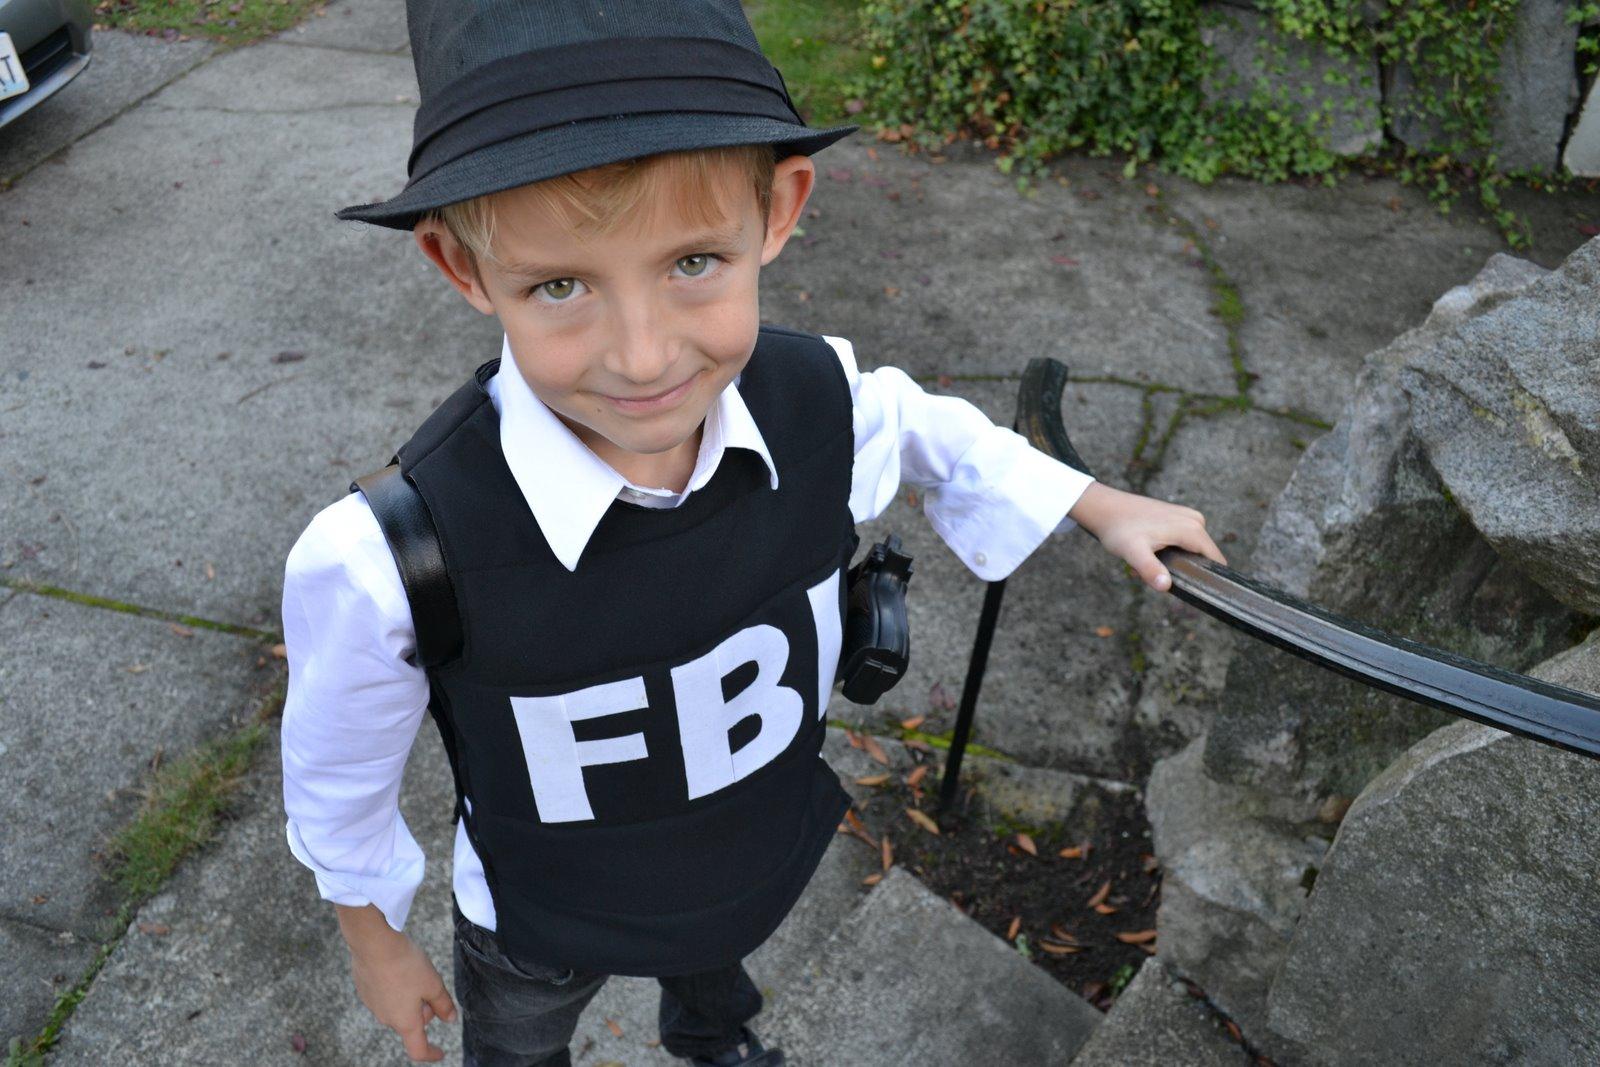 Real Fbi Agent Recap - fbi special agentReal Fbi Agent